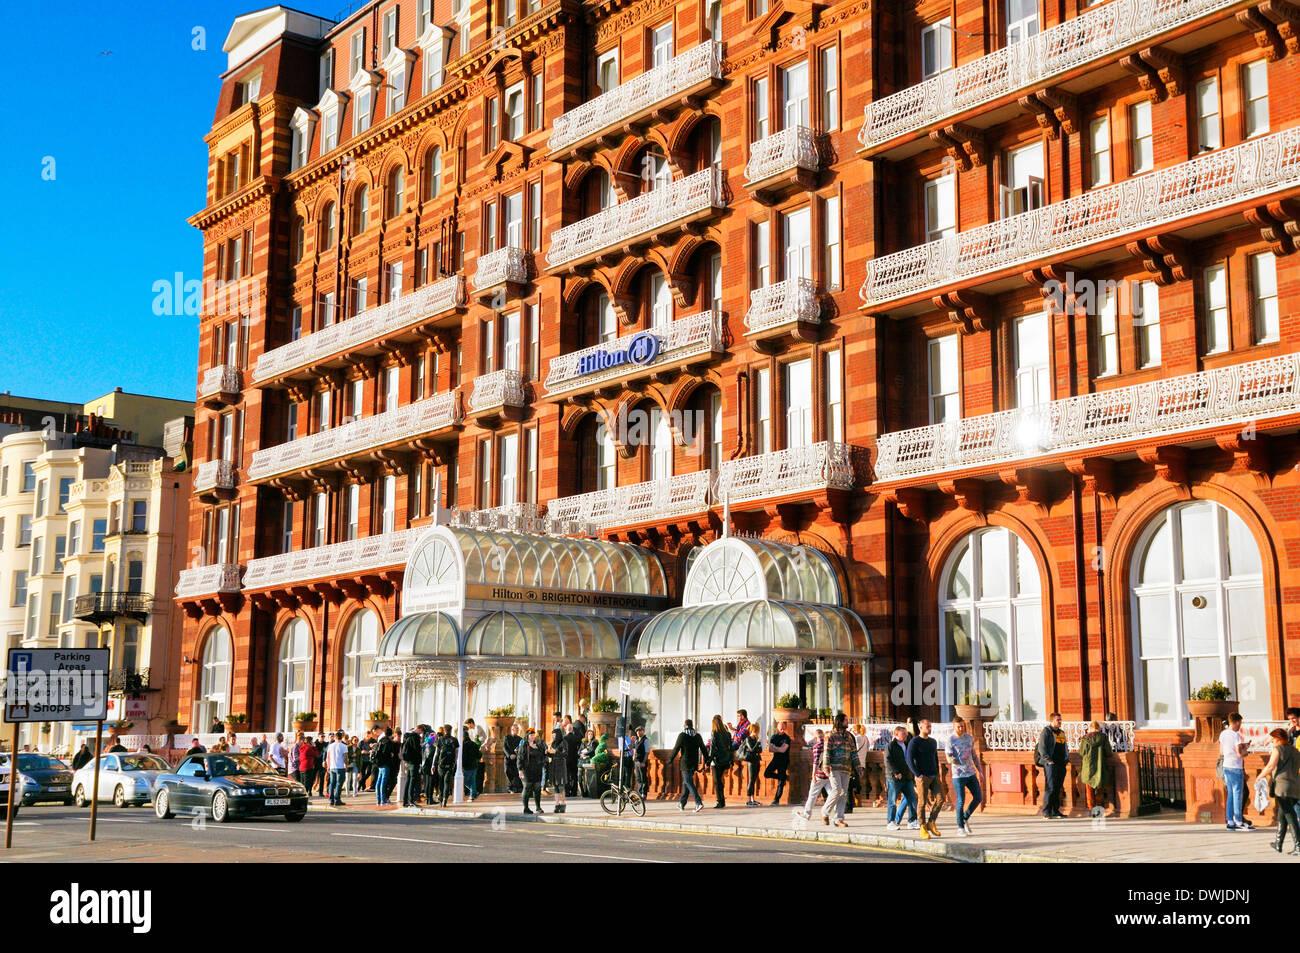 Hilton Brighton Metropole Hotel, Kings Road, Brighton, East Sussex, England, UK Stockbild